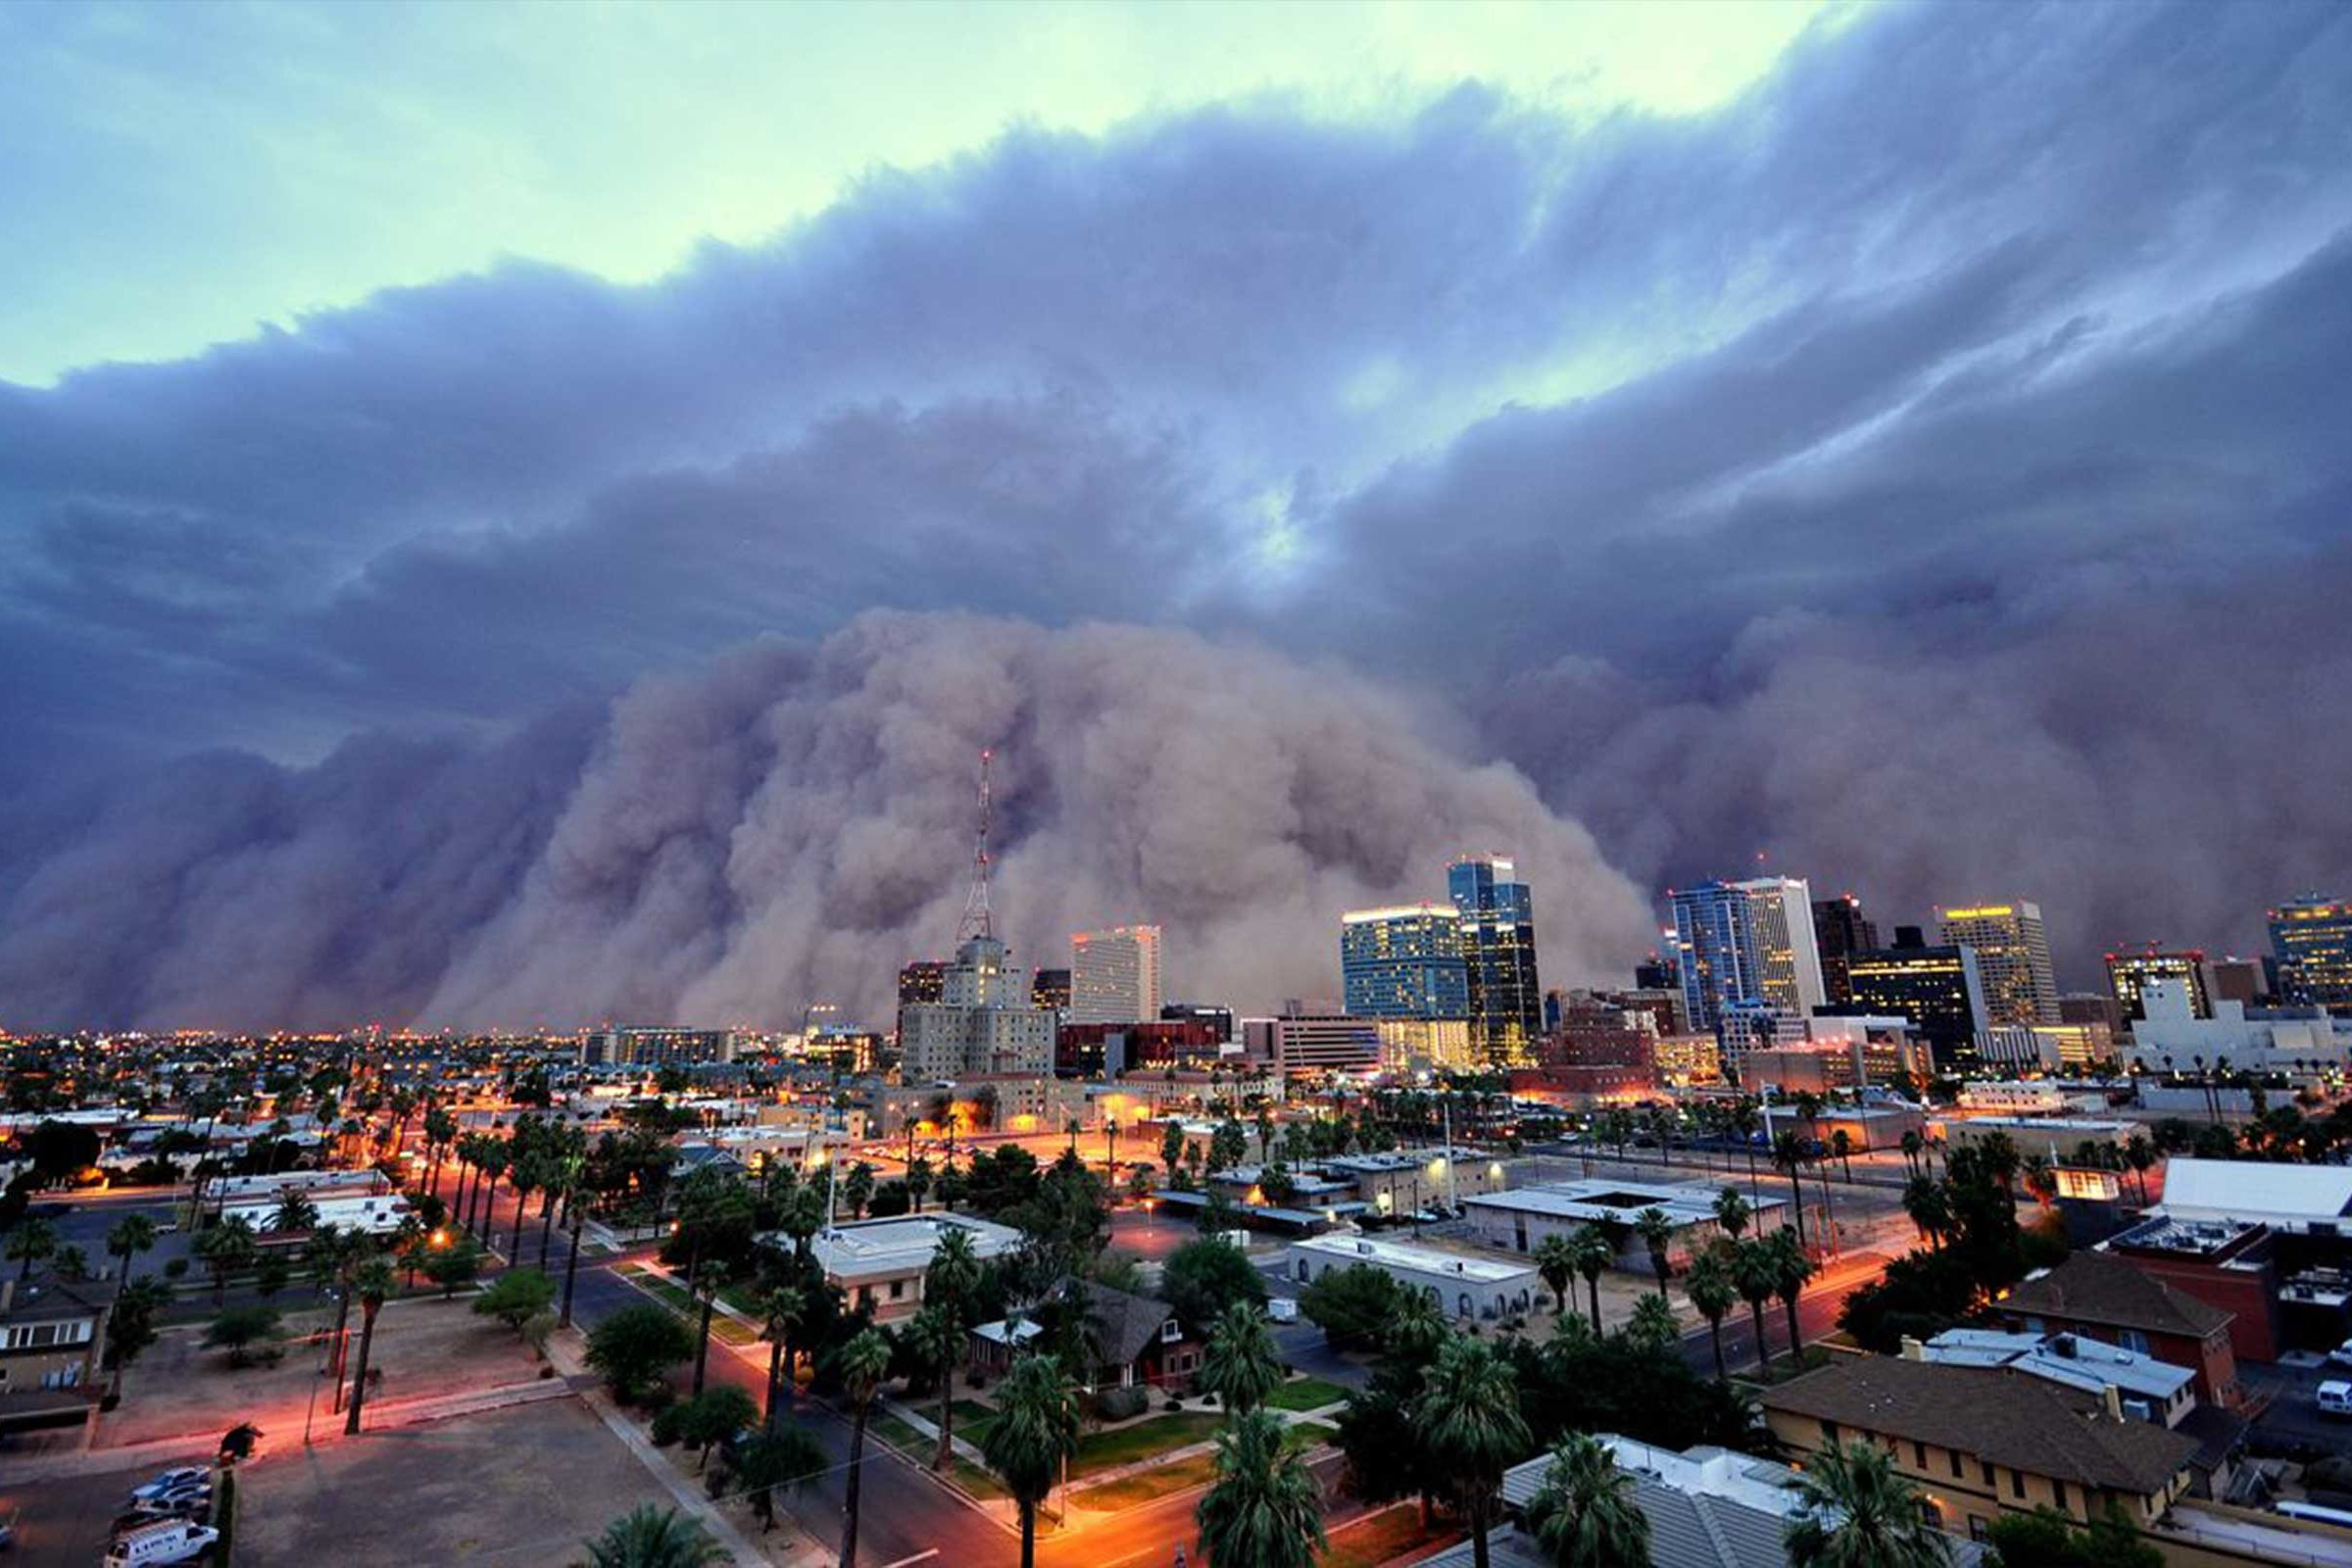 A dust storm in Phoenix, Arizona. Credit: Daniel J Bryant/Getty